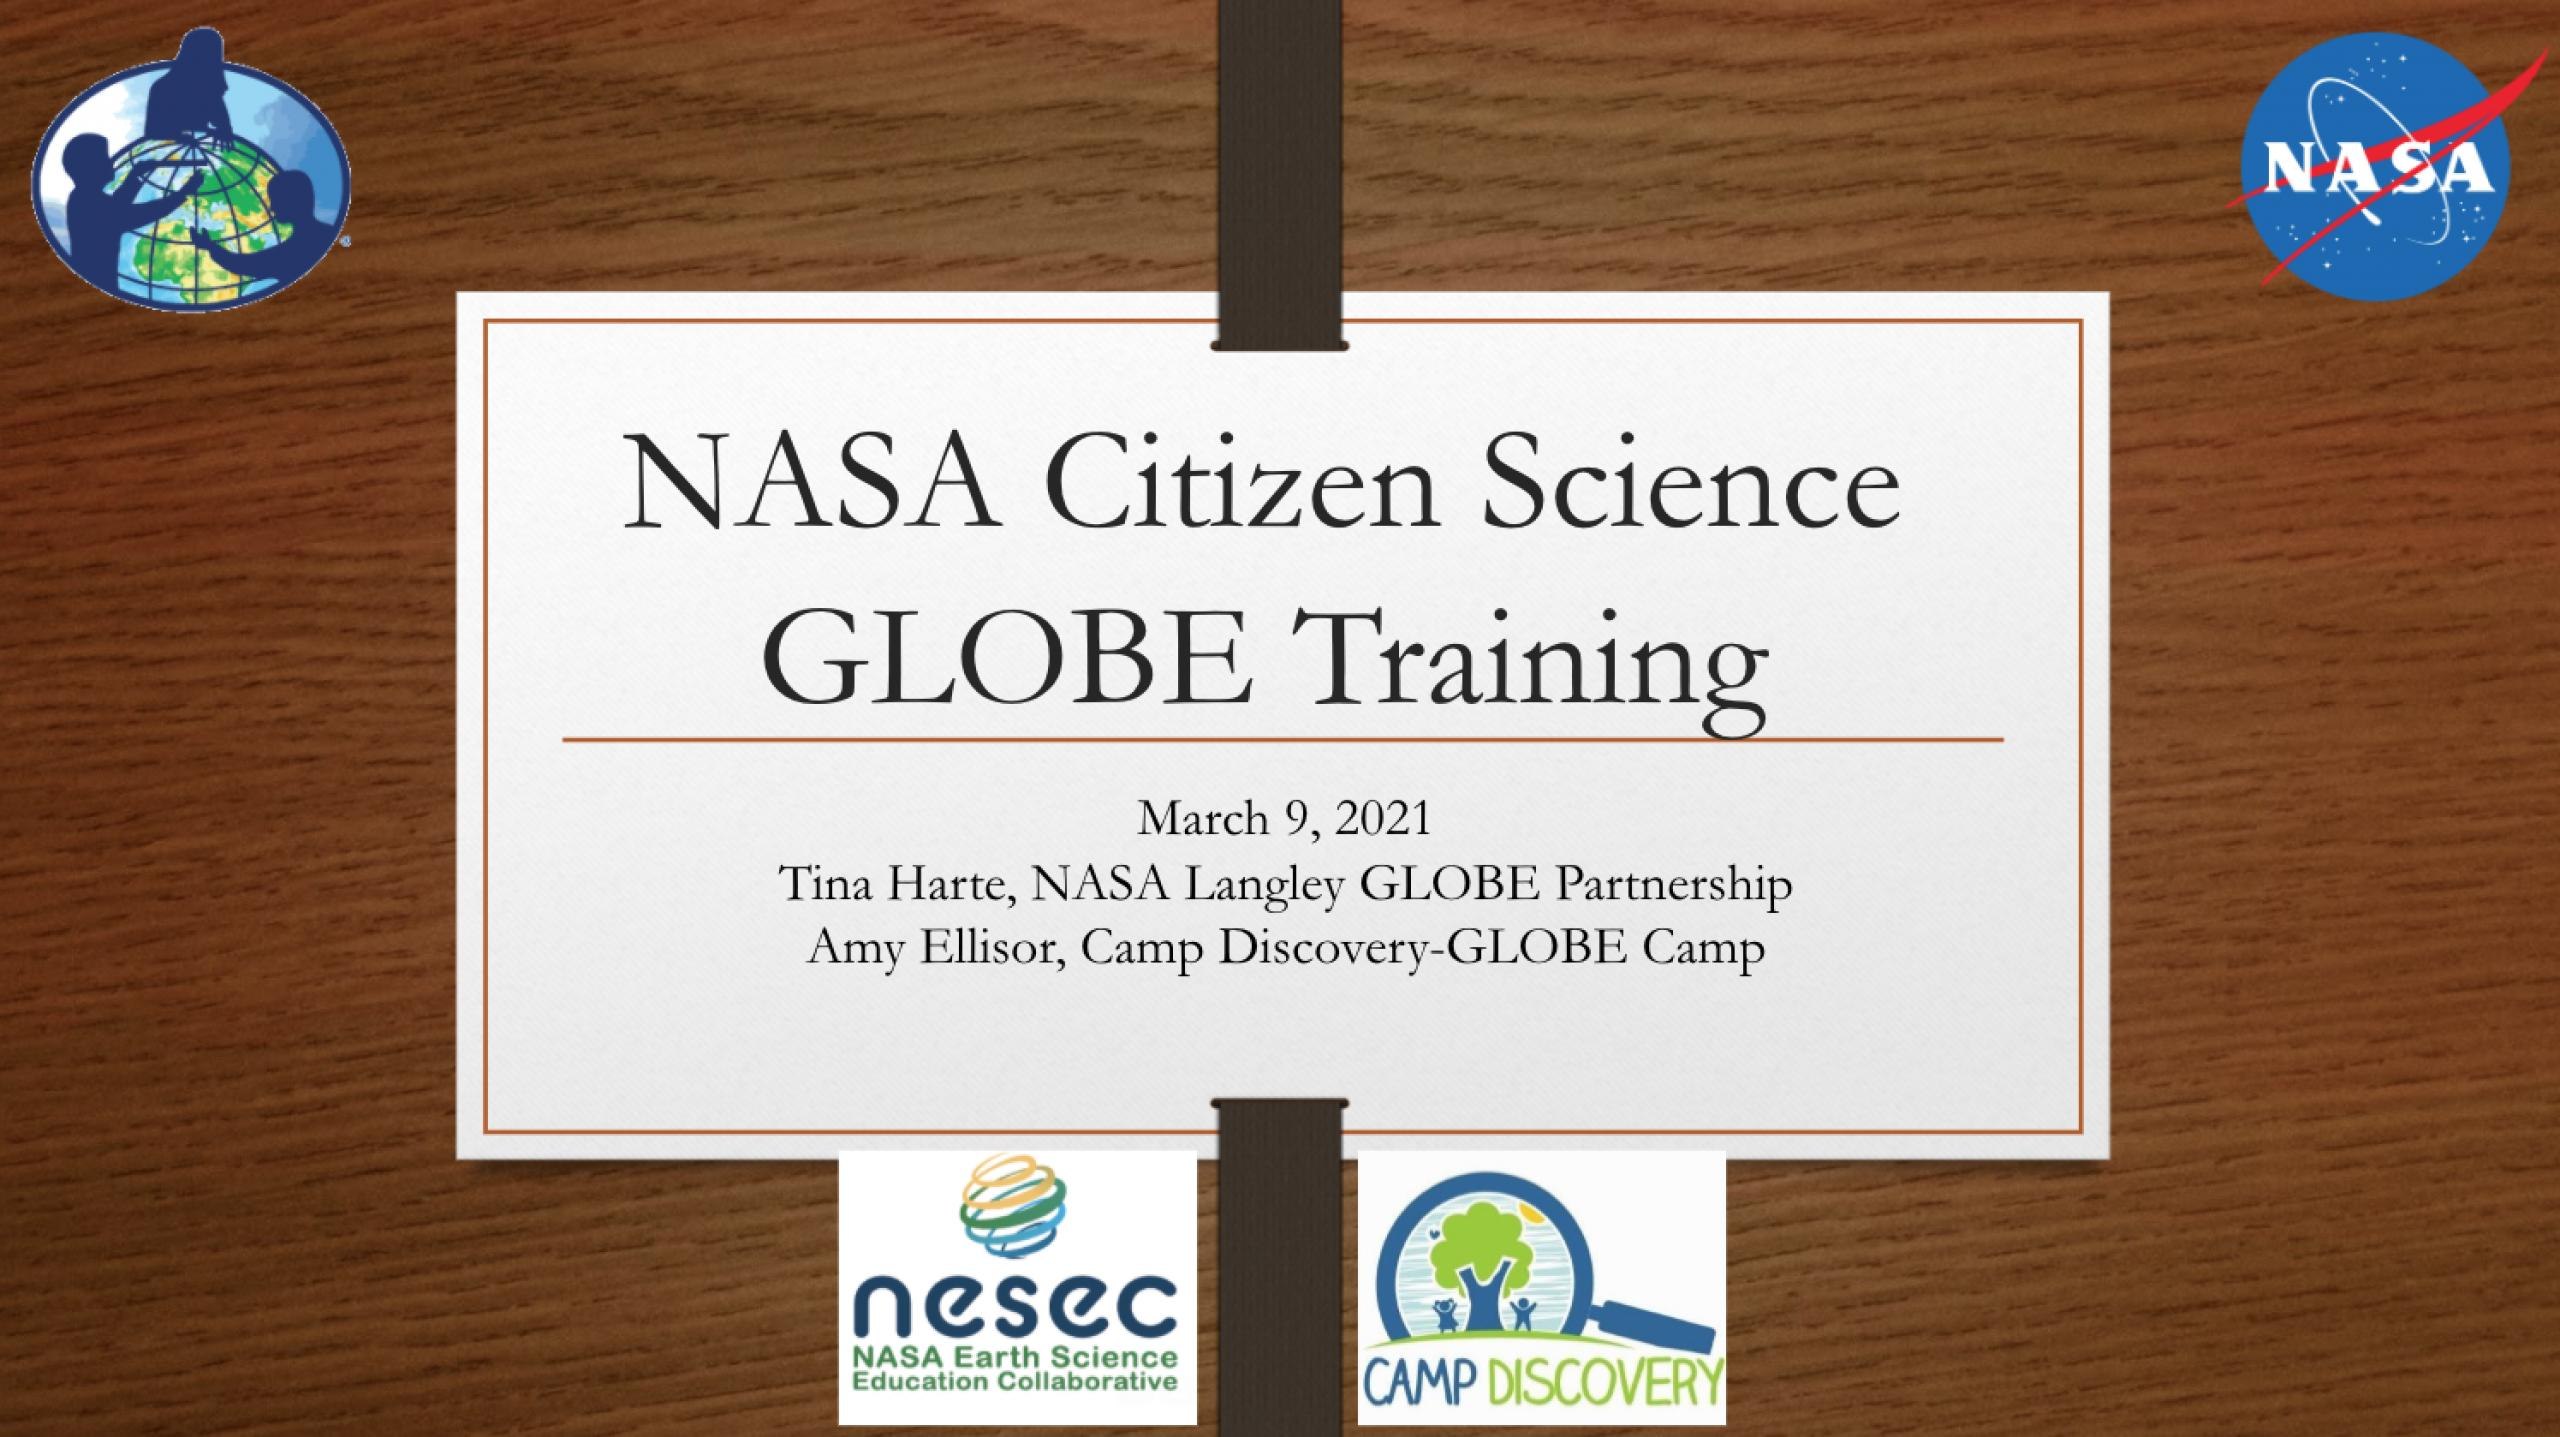 Intro slide for NASA Citizen Science GLOBE Training.